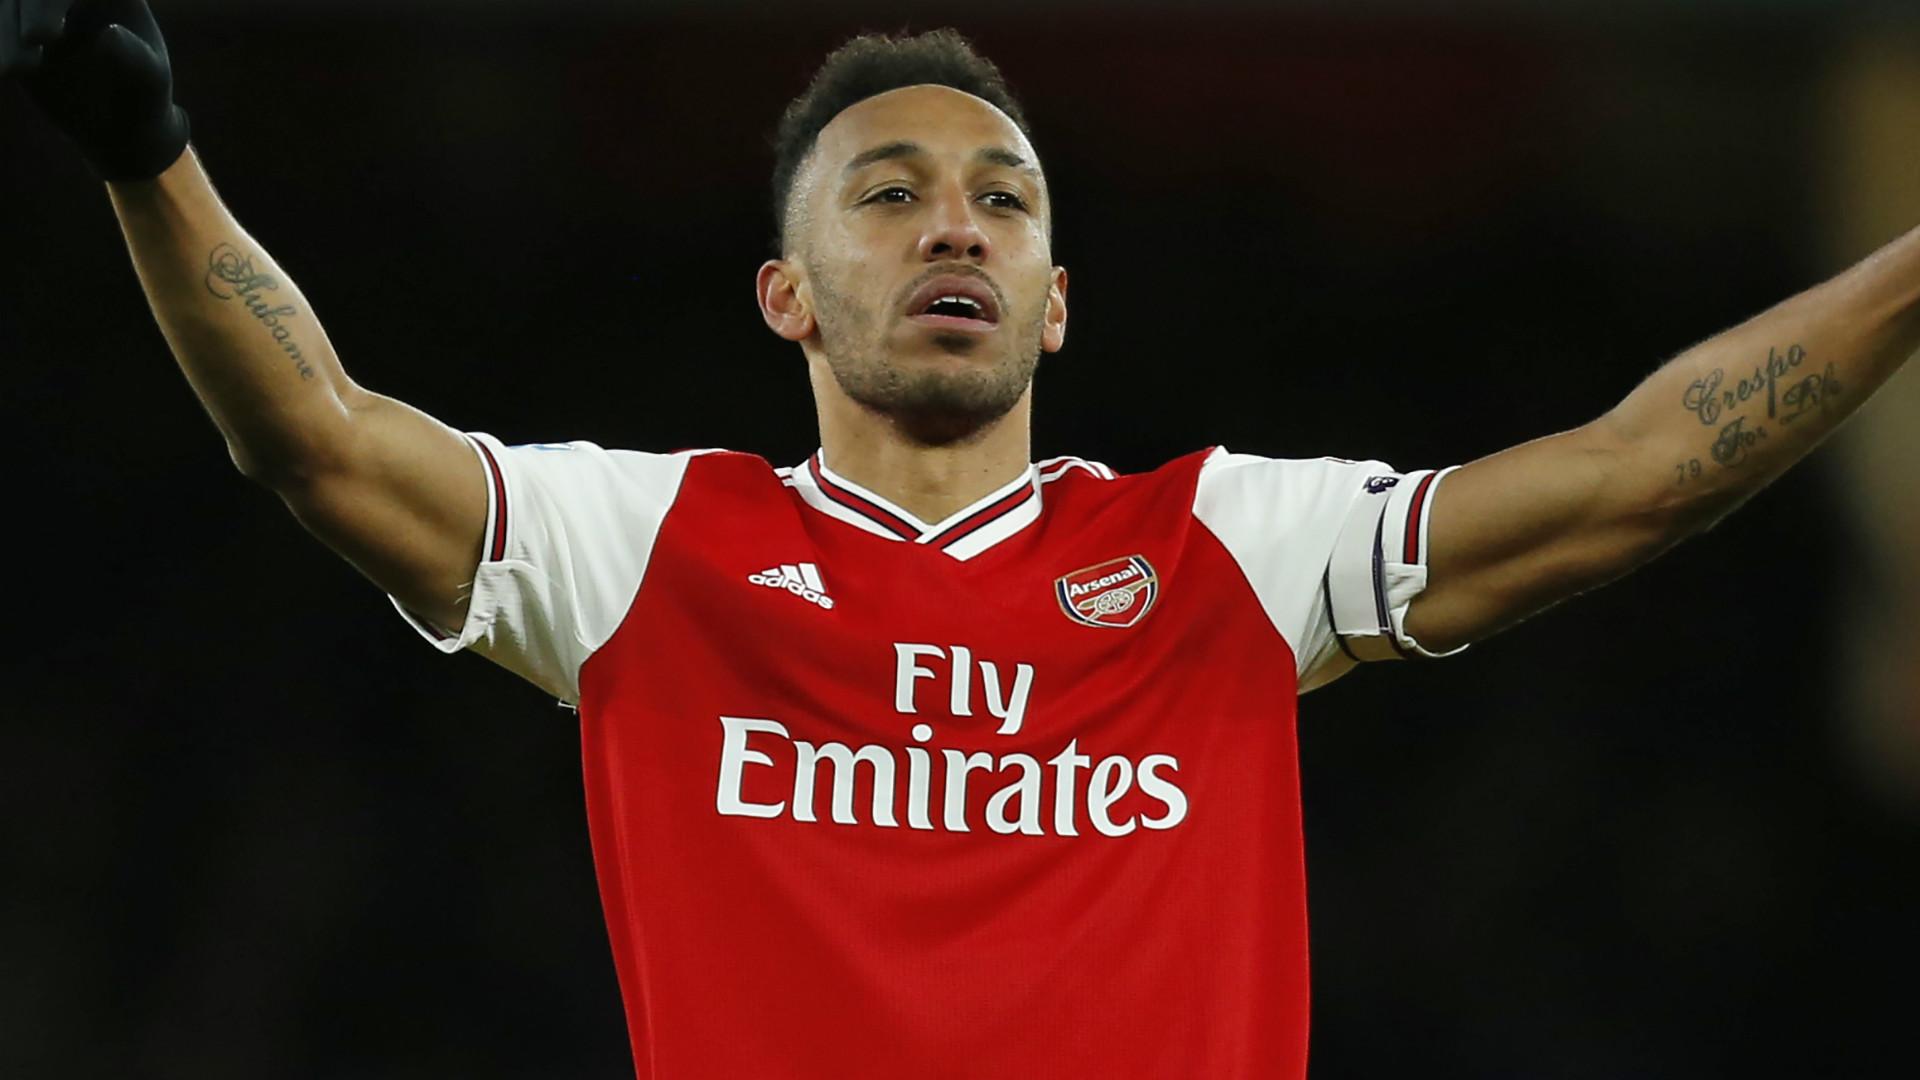 Obamejang donio trijumf Arsenalu